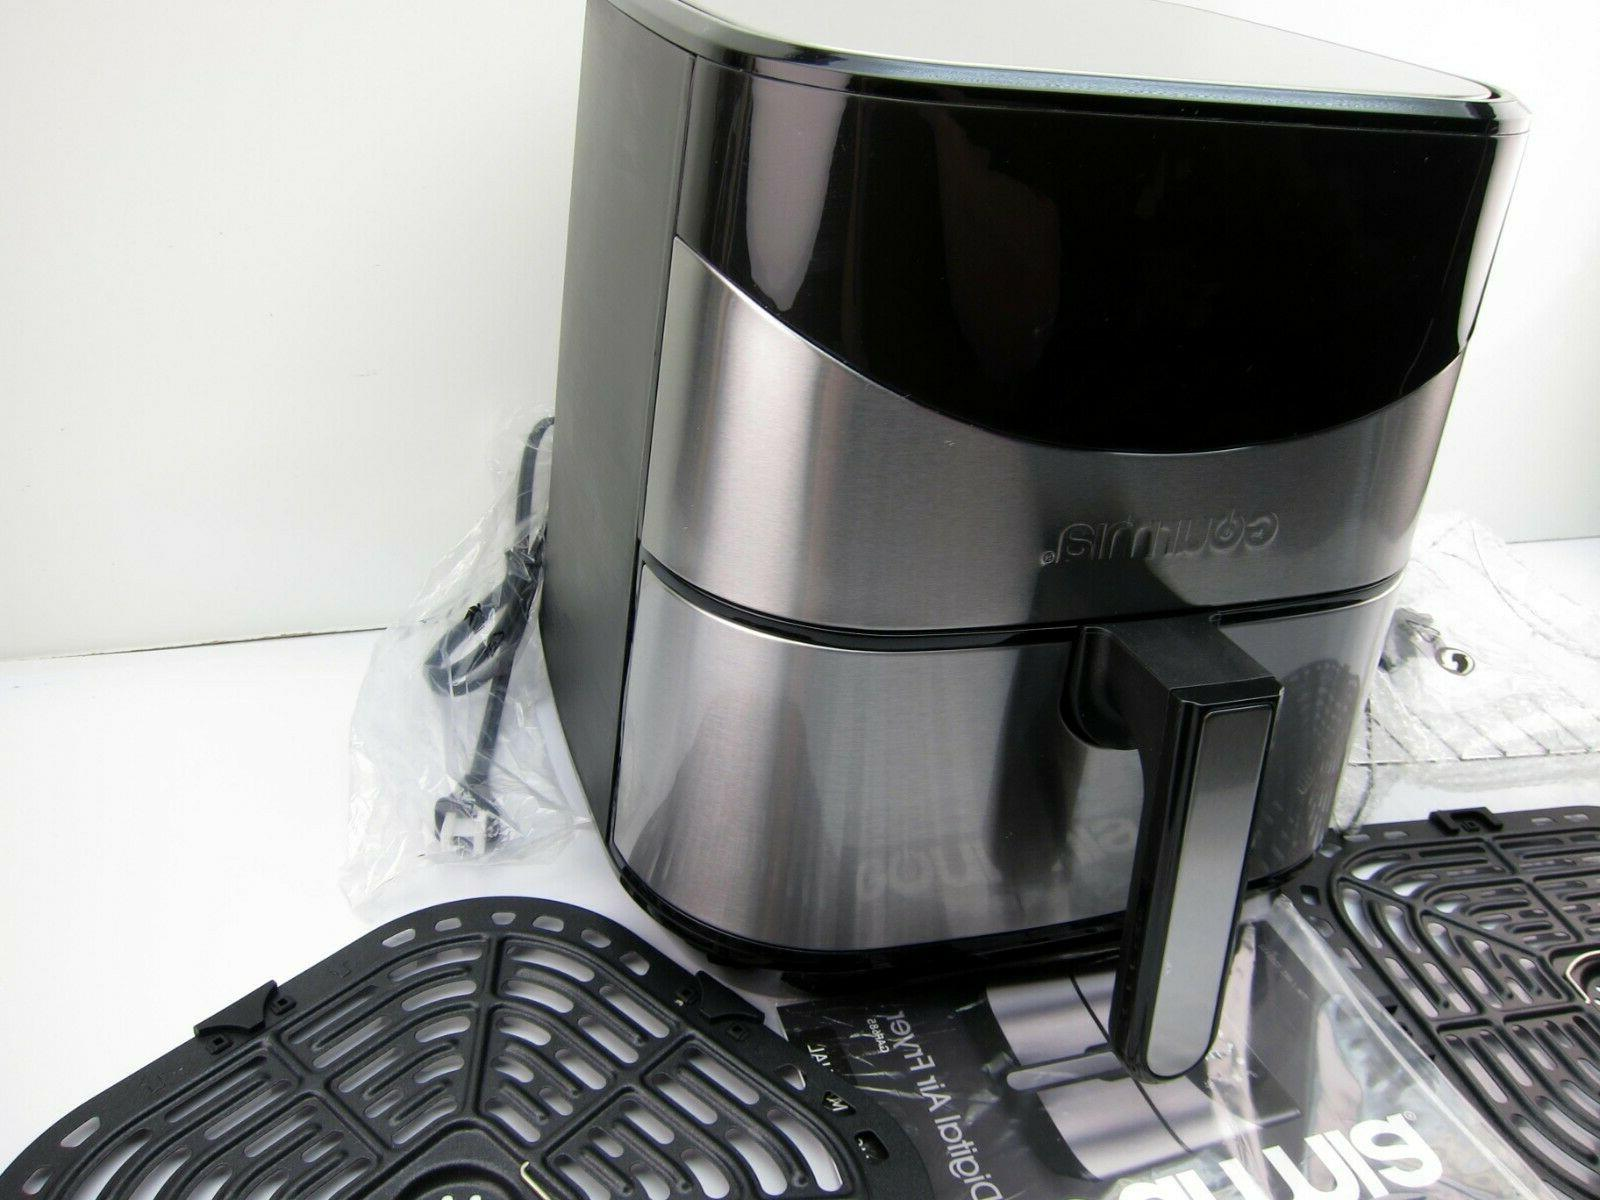 NEW Qt. Stainless Digital Air Fryer